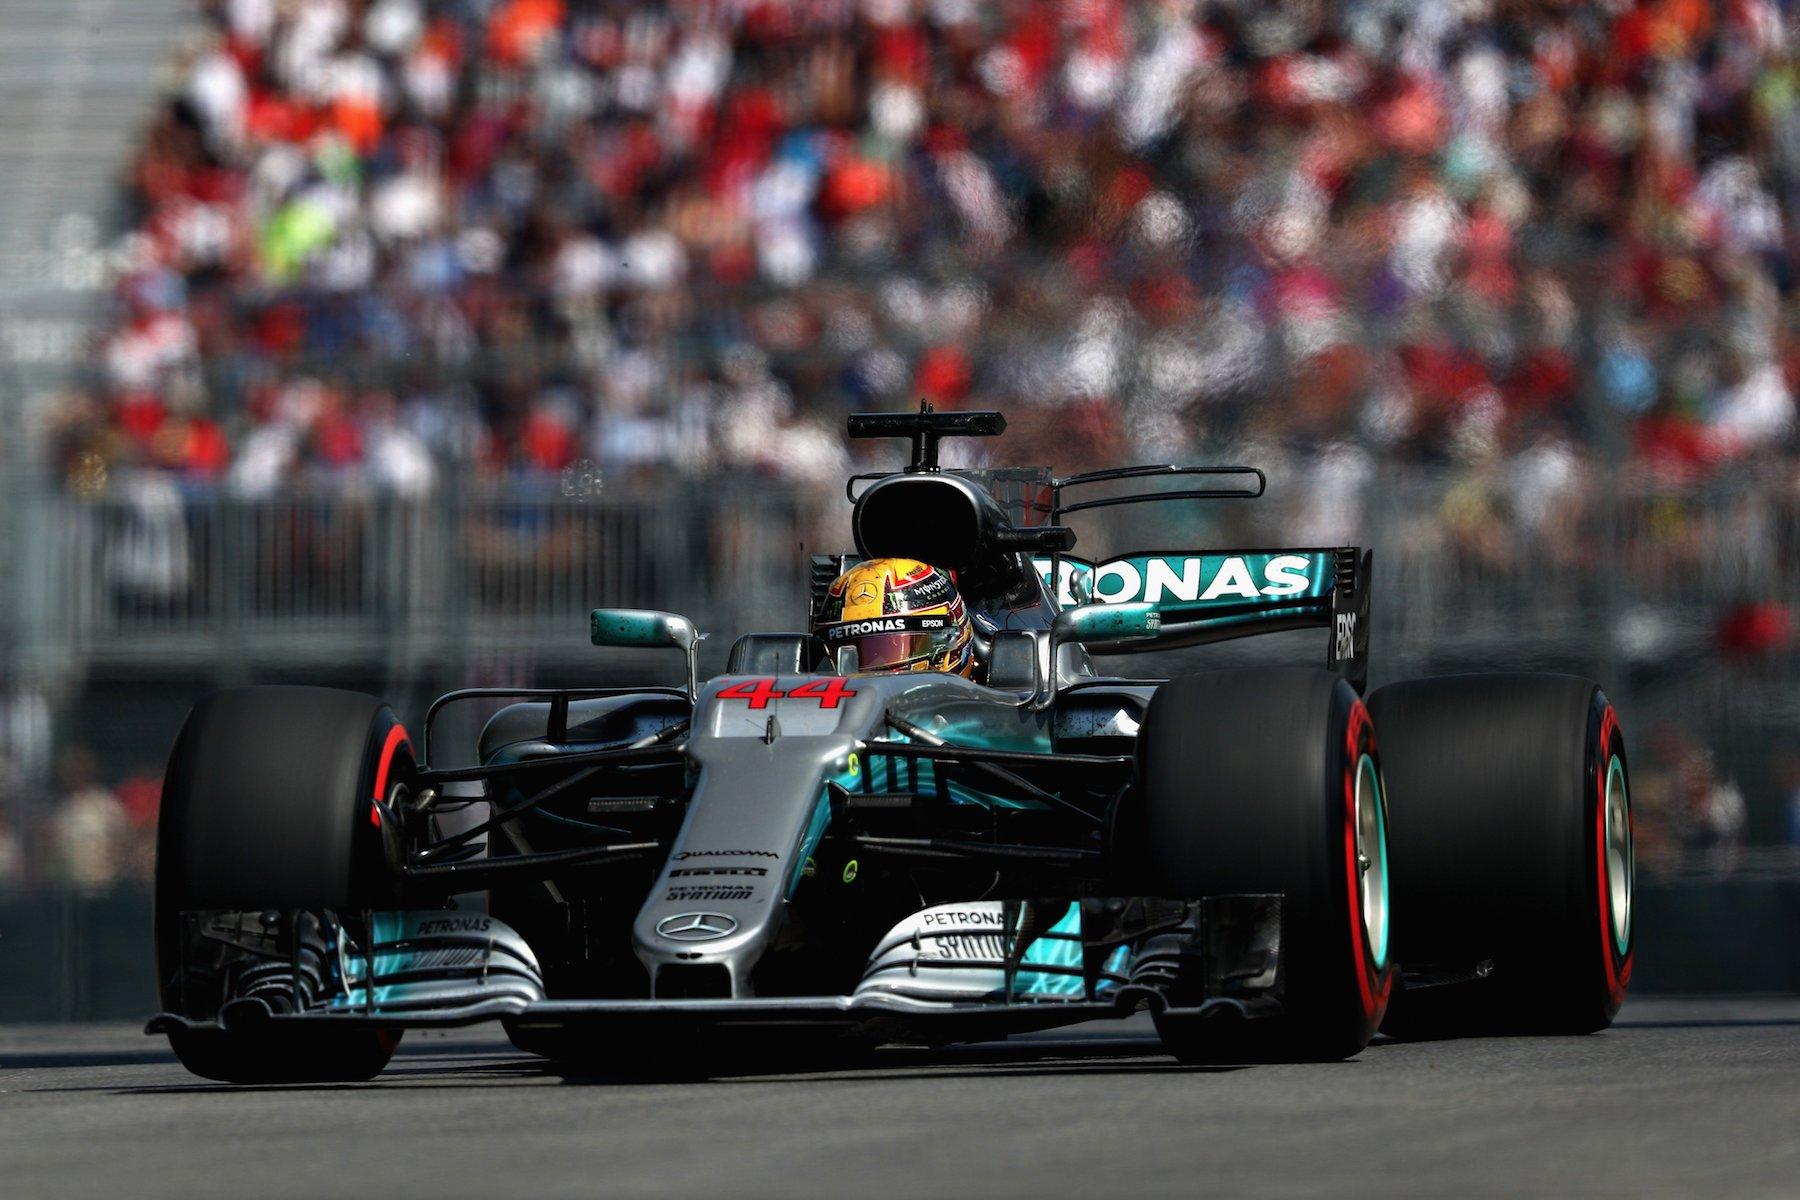 H 2017 Lewis Hamilton | Mercedes W08 | 2017 Canadian GP winner 1 copy.jpg